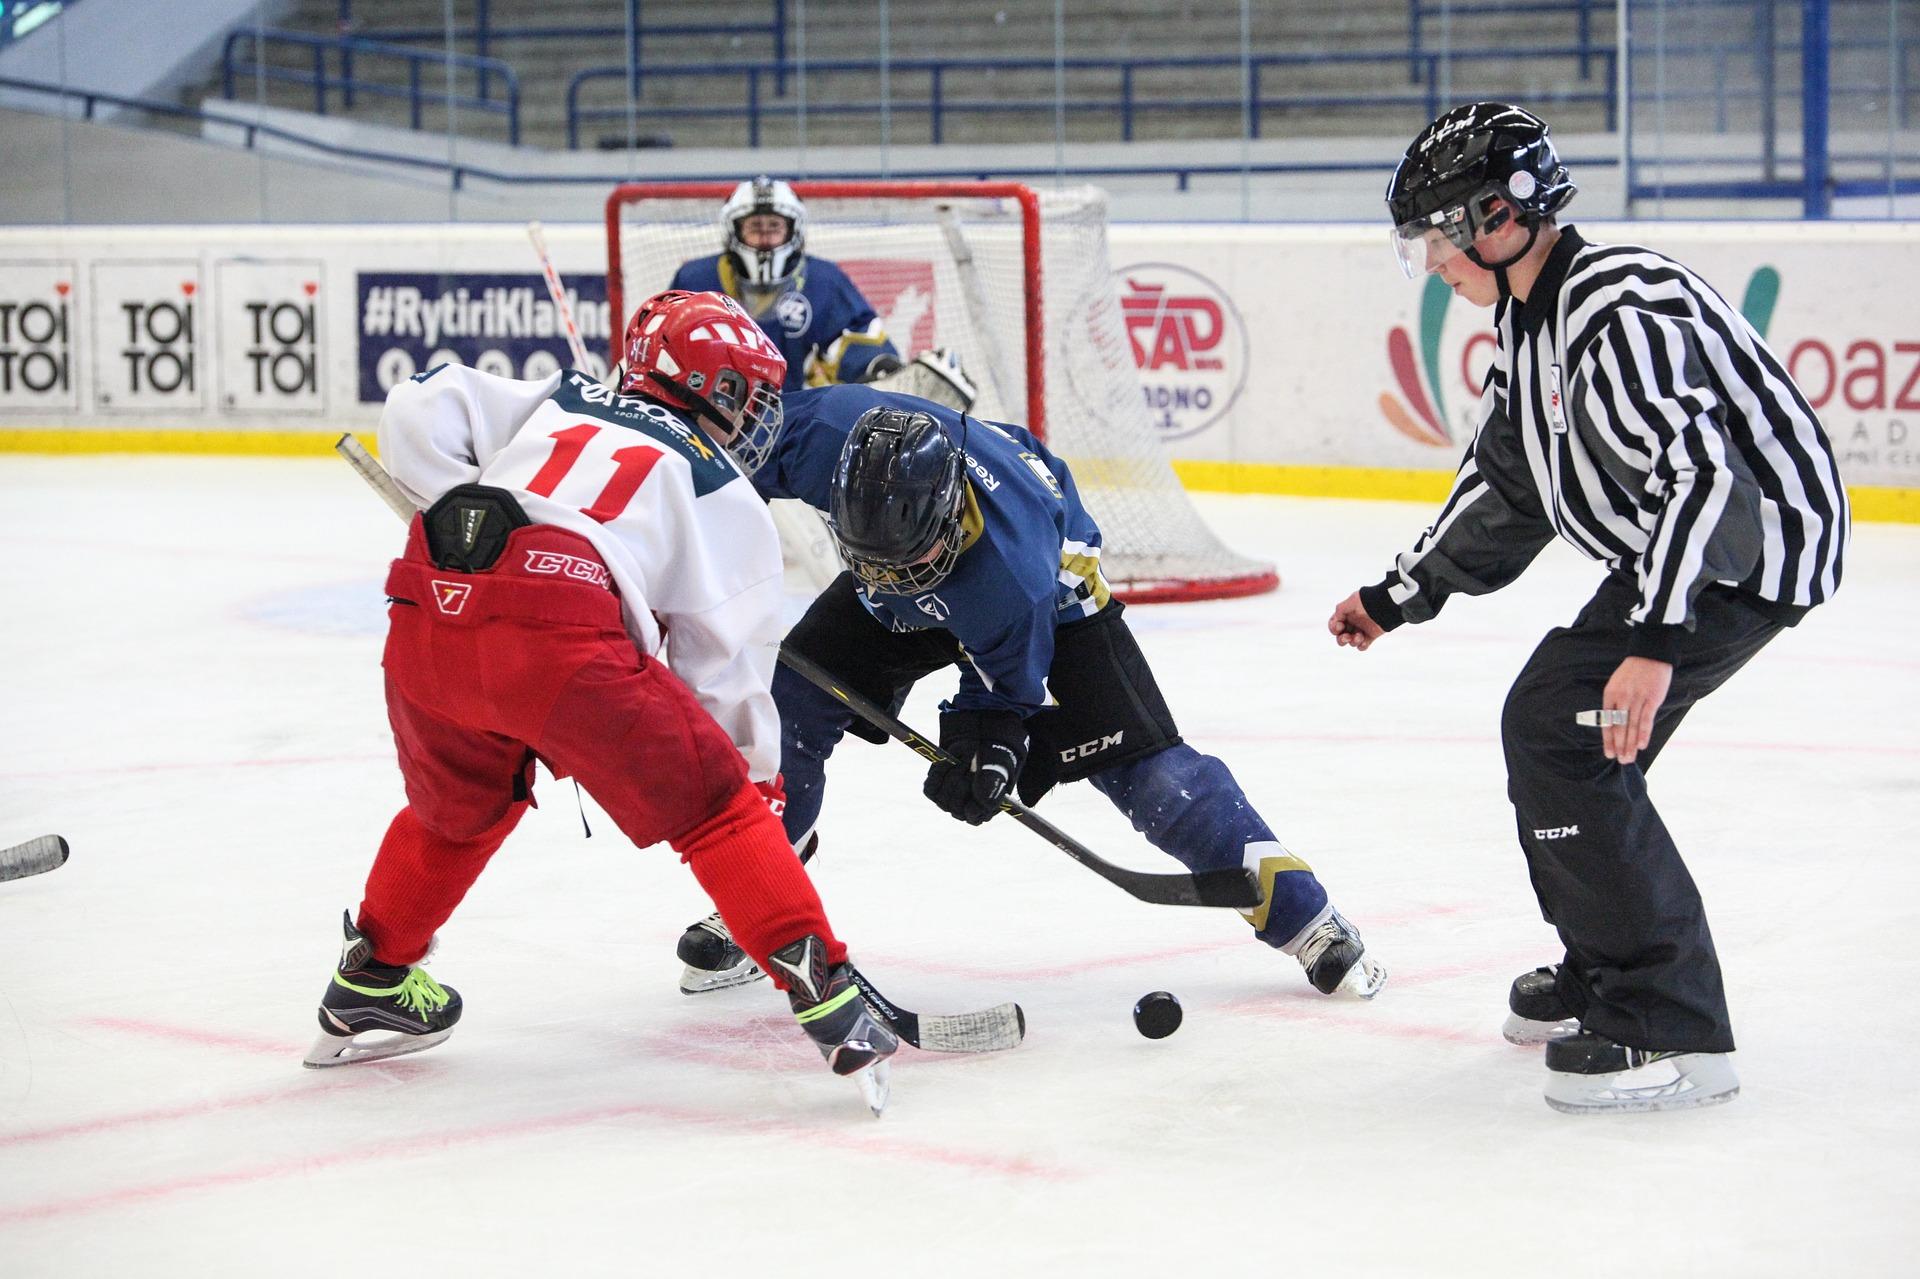 hockey-2744907_1920.jpg